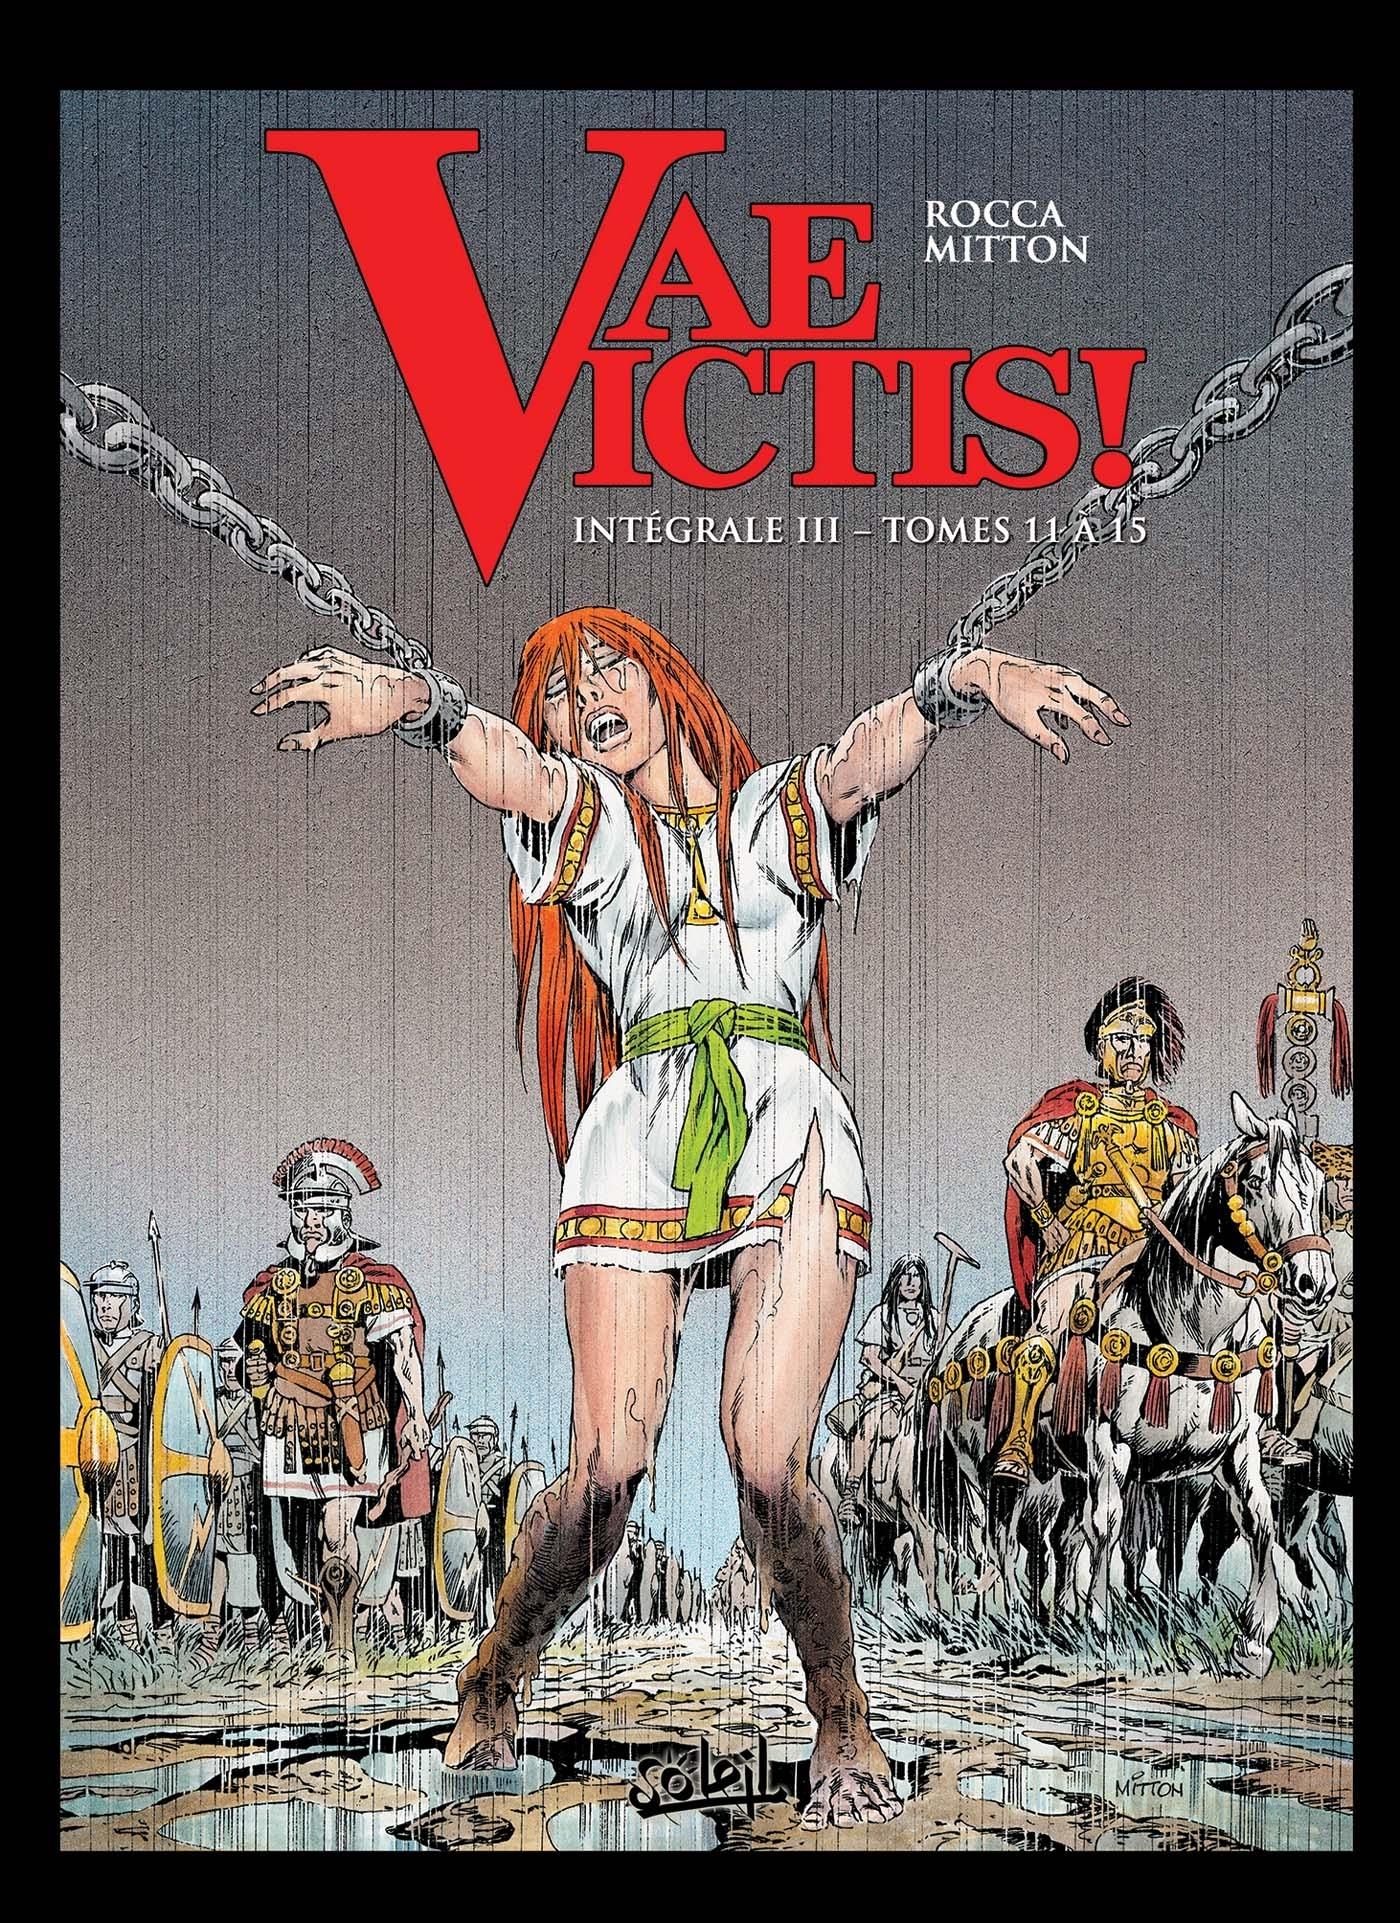 VAE VICTIS ! INTEGRALE T03 - T11 A T15